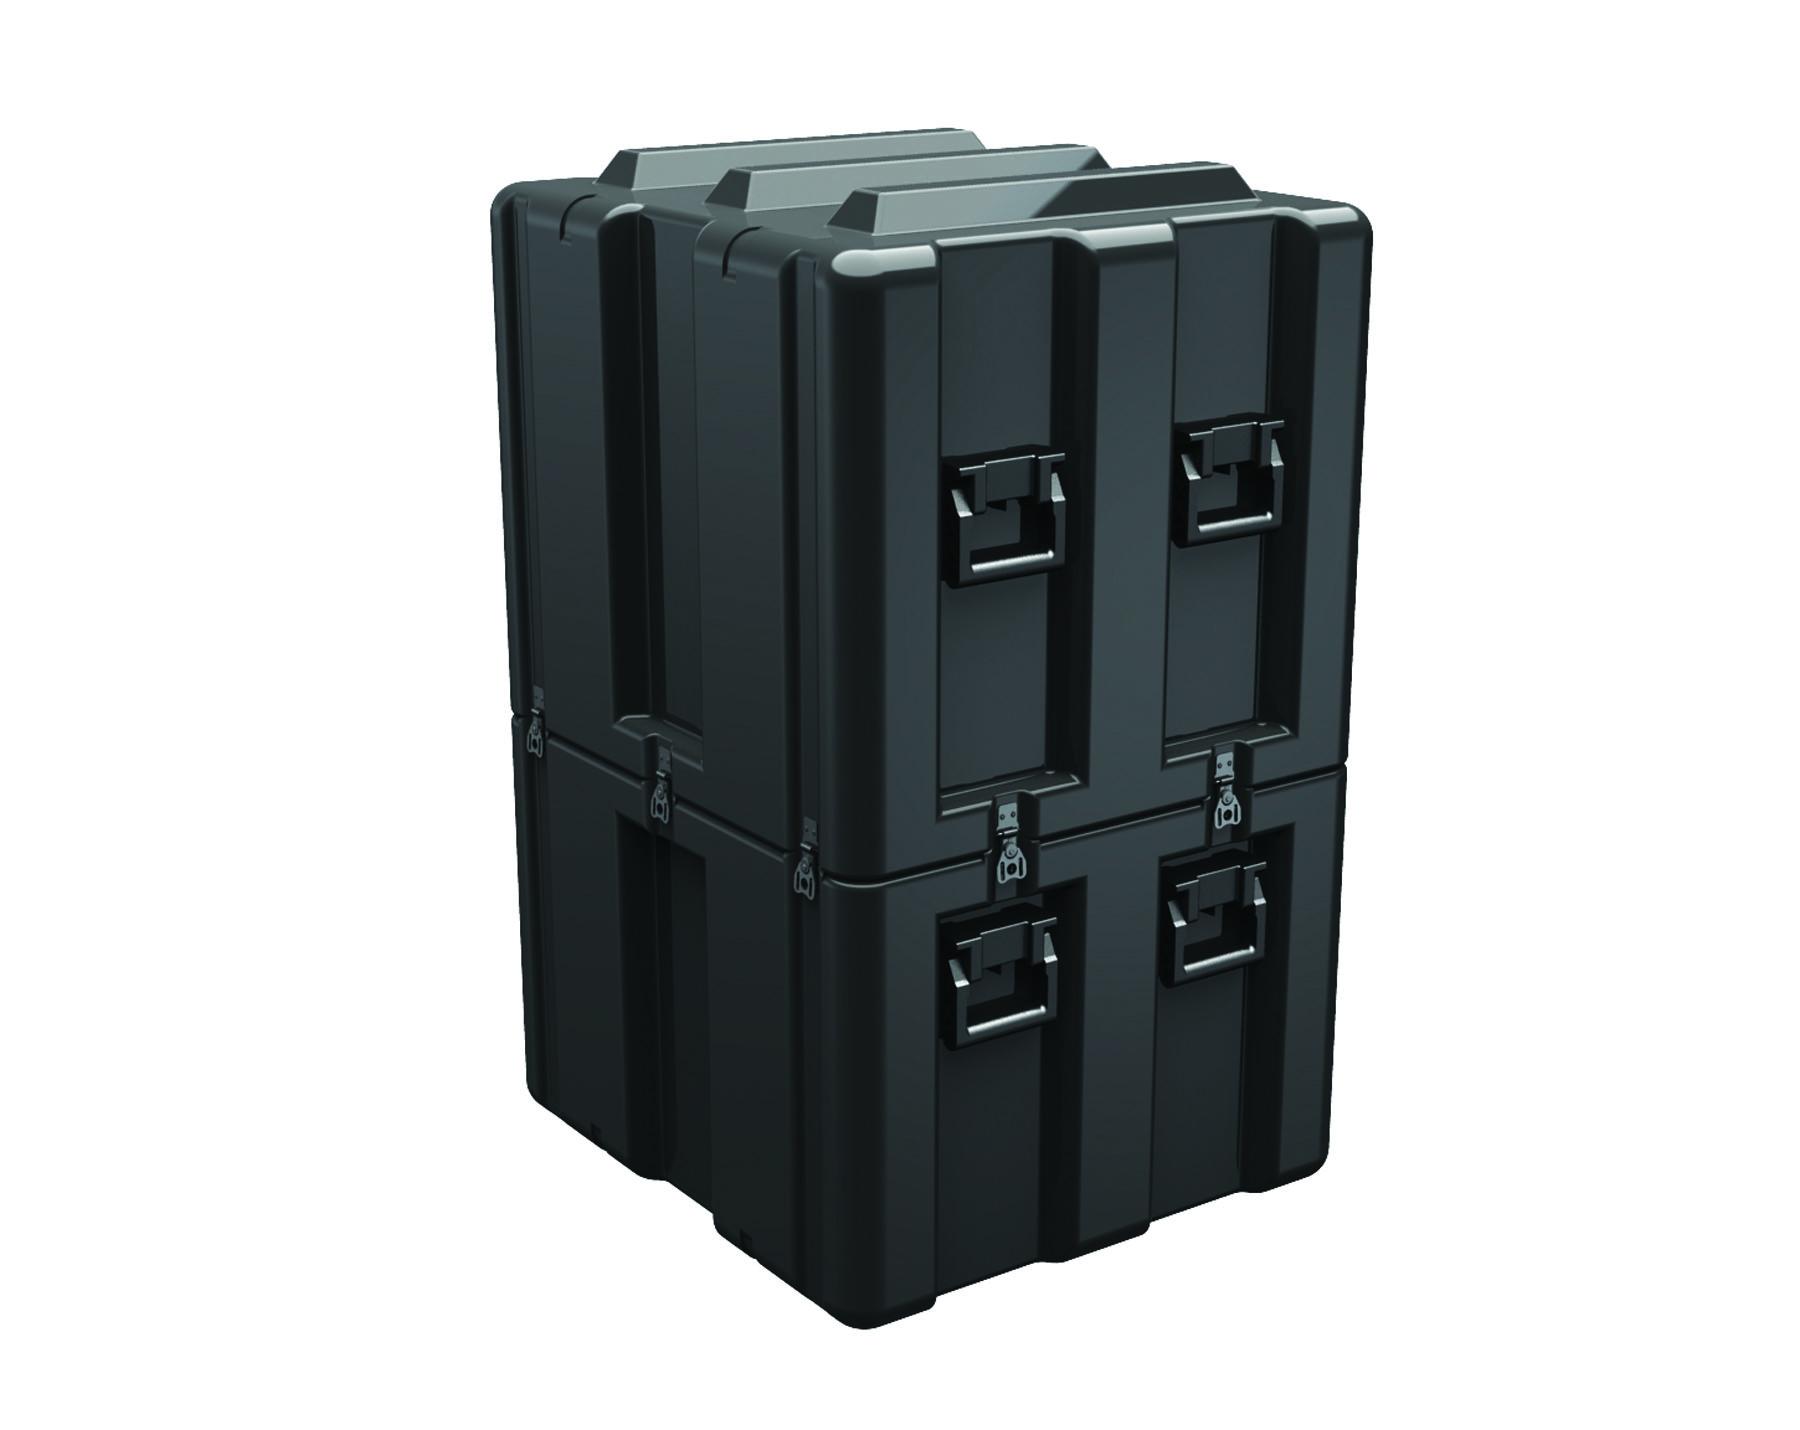 AL2624-1824 - AL2624-1824 Removable Single Lid Case - CasesTSA